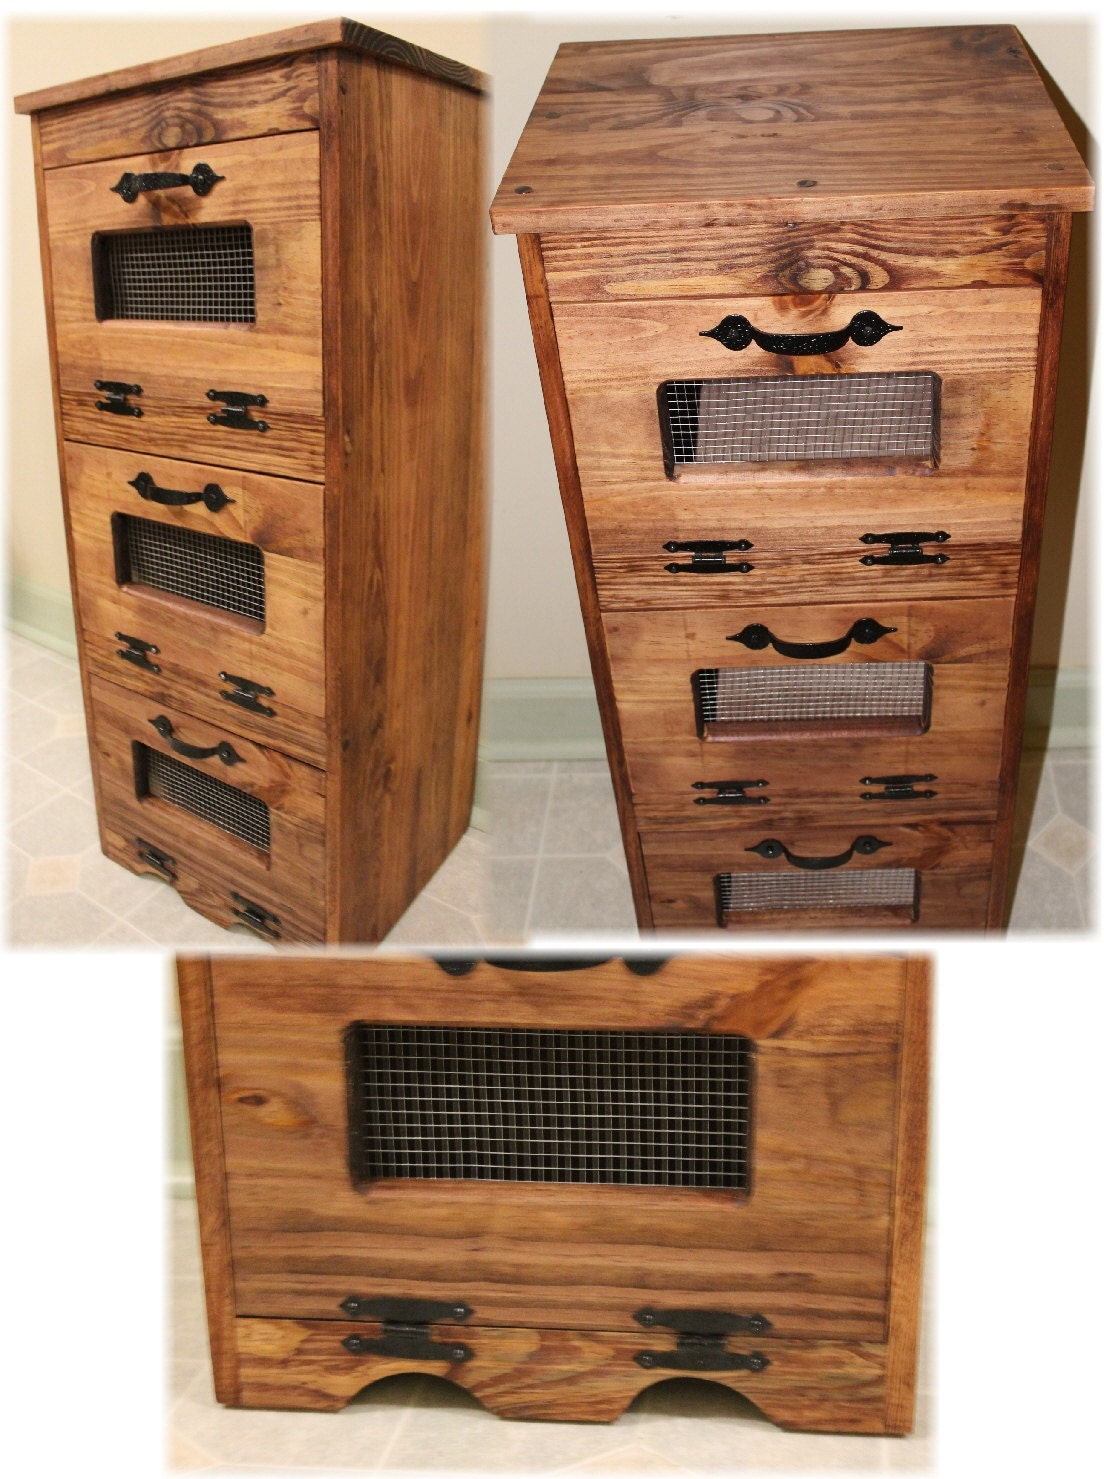 pomme de terre bin bois rangement primitif v g tal de cuisine. Black Bedroom Furniture Sets. Home Design Ideas